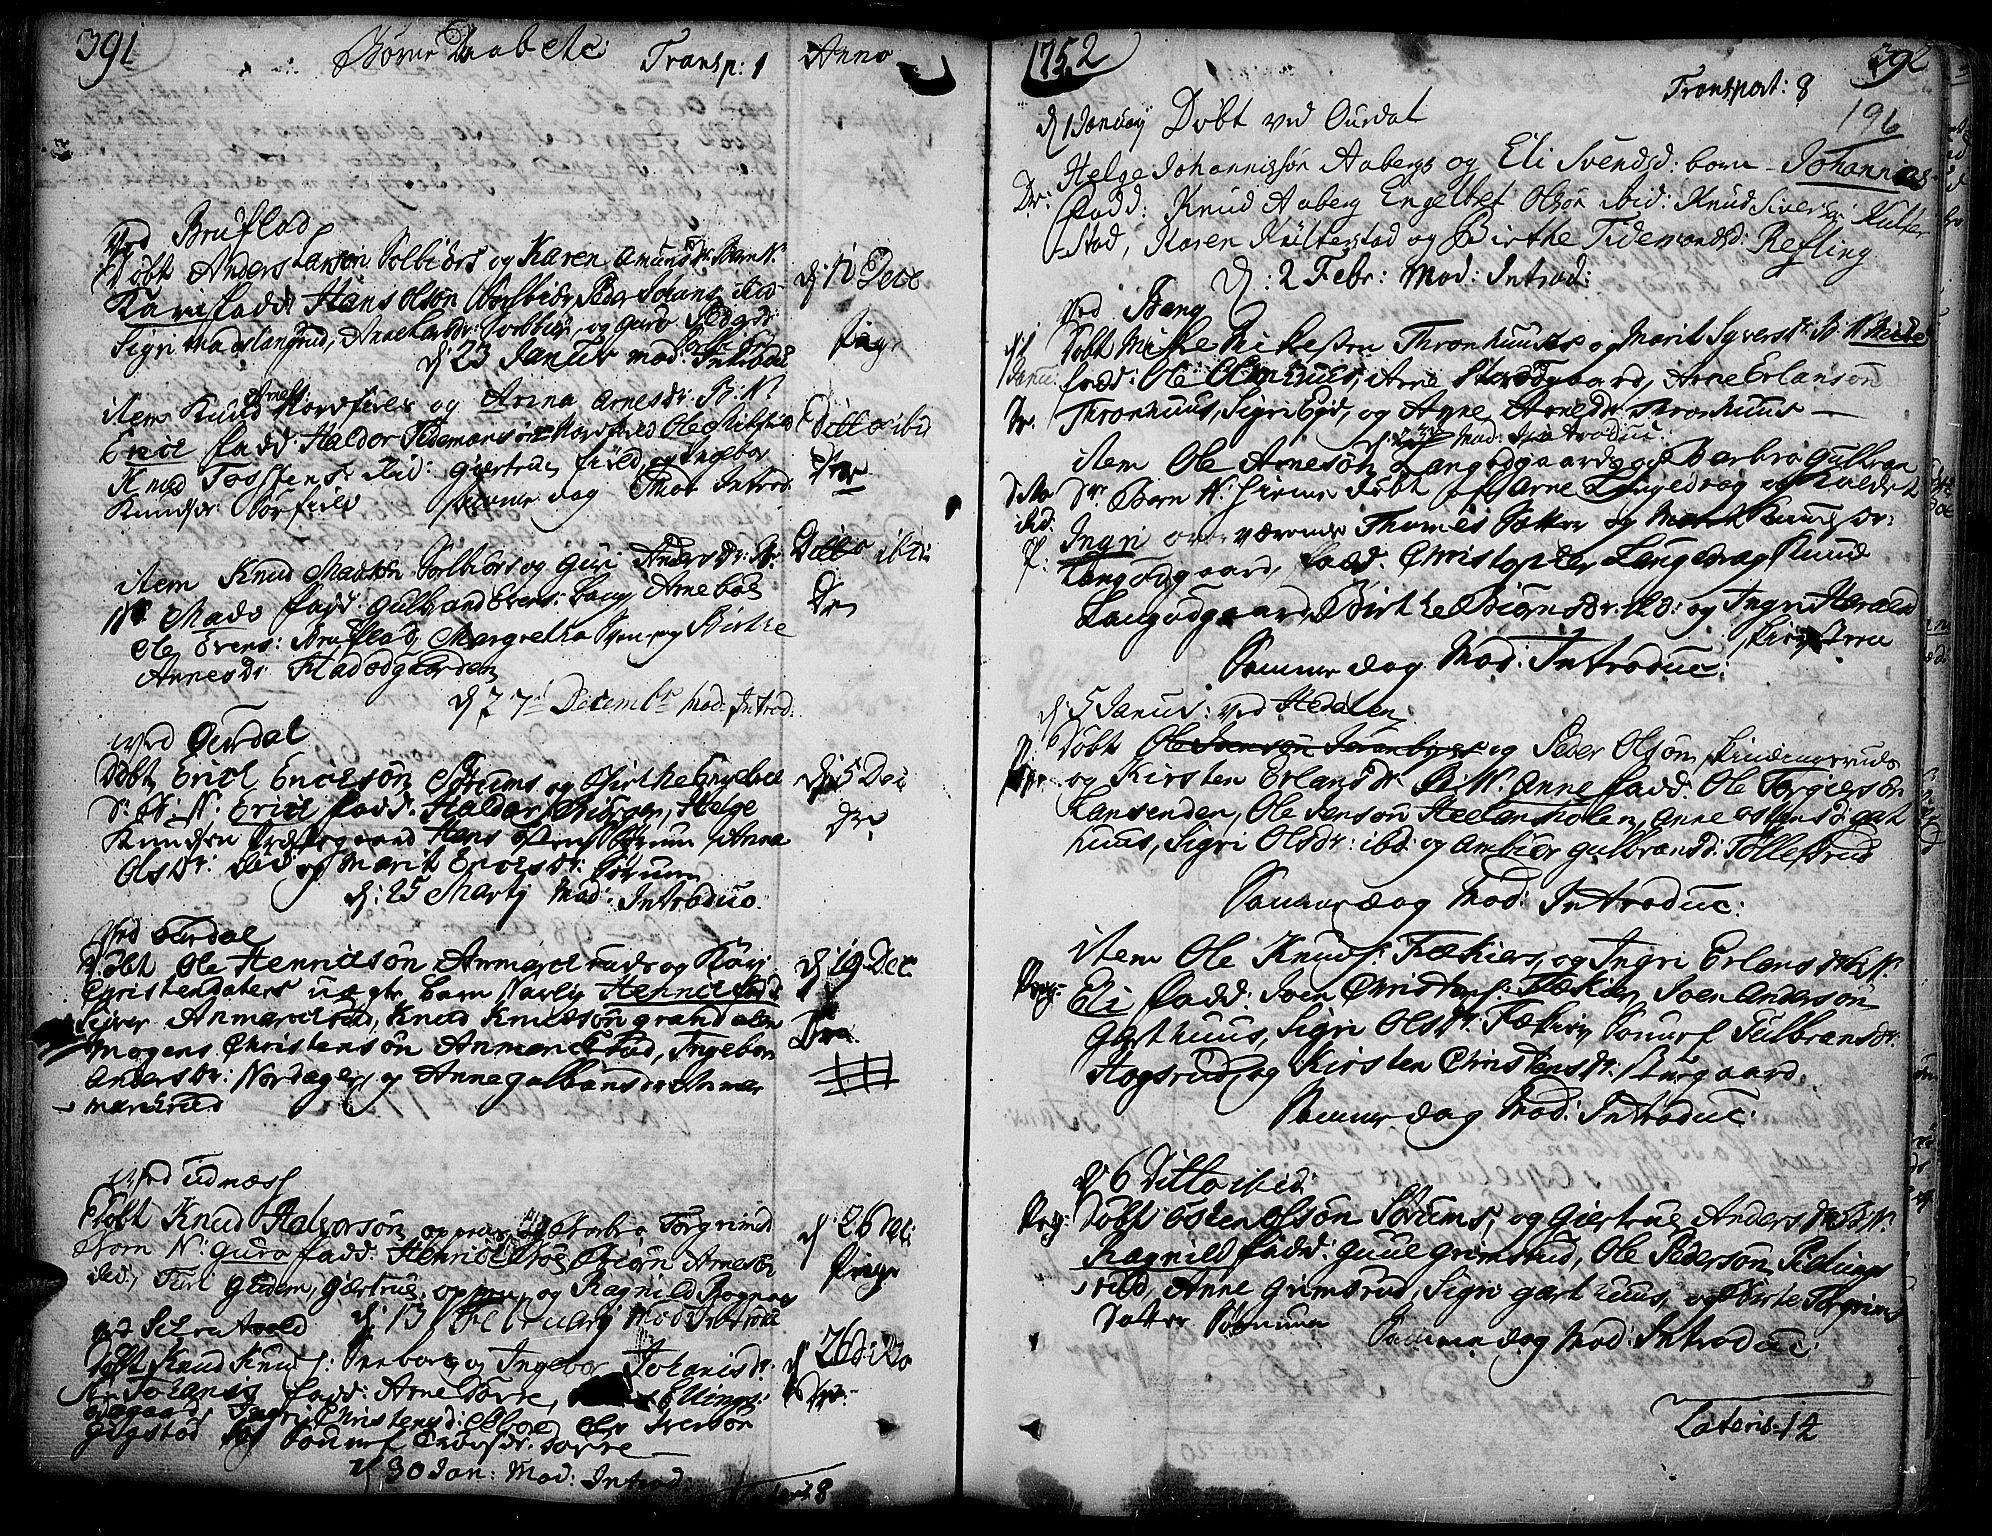 SAH, Aurdal prestekontor, Ministerialbok nr. 4, 1730-1762, s. 391-392